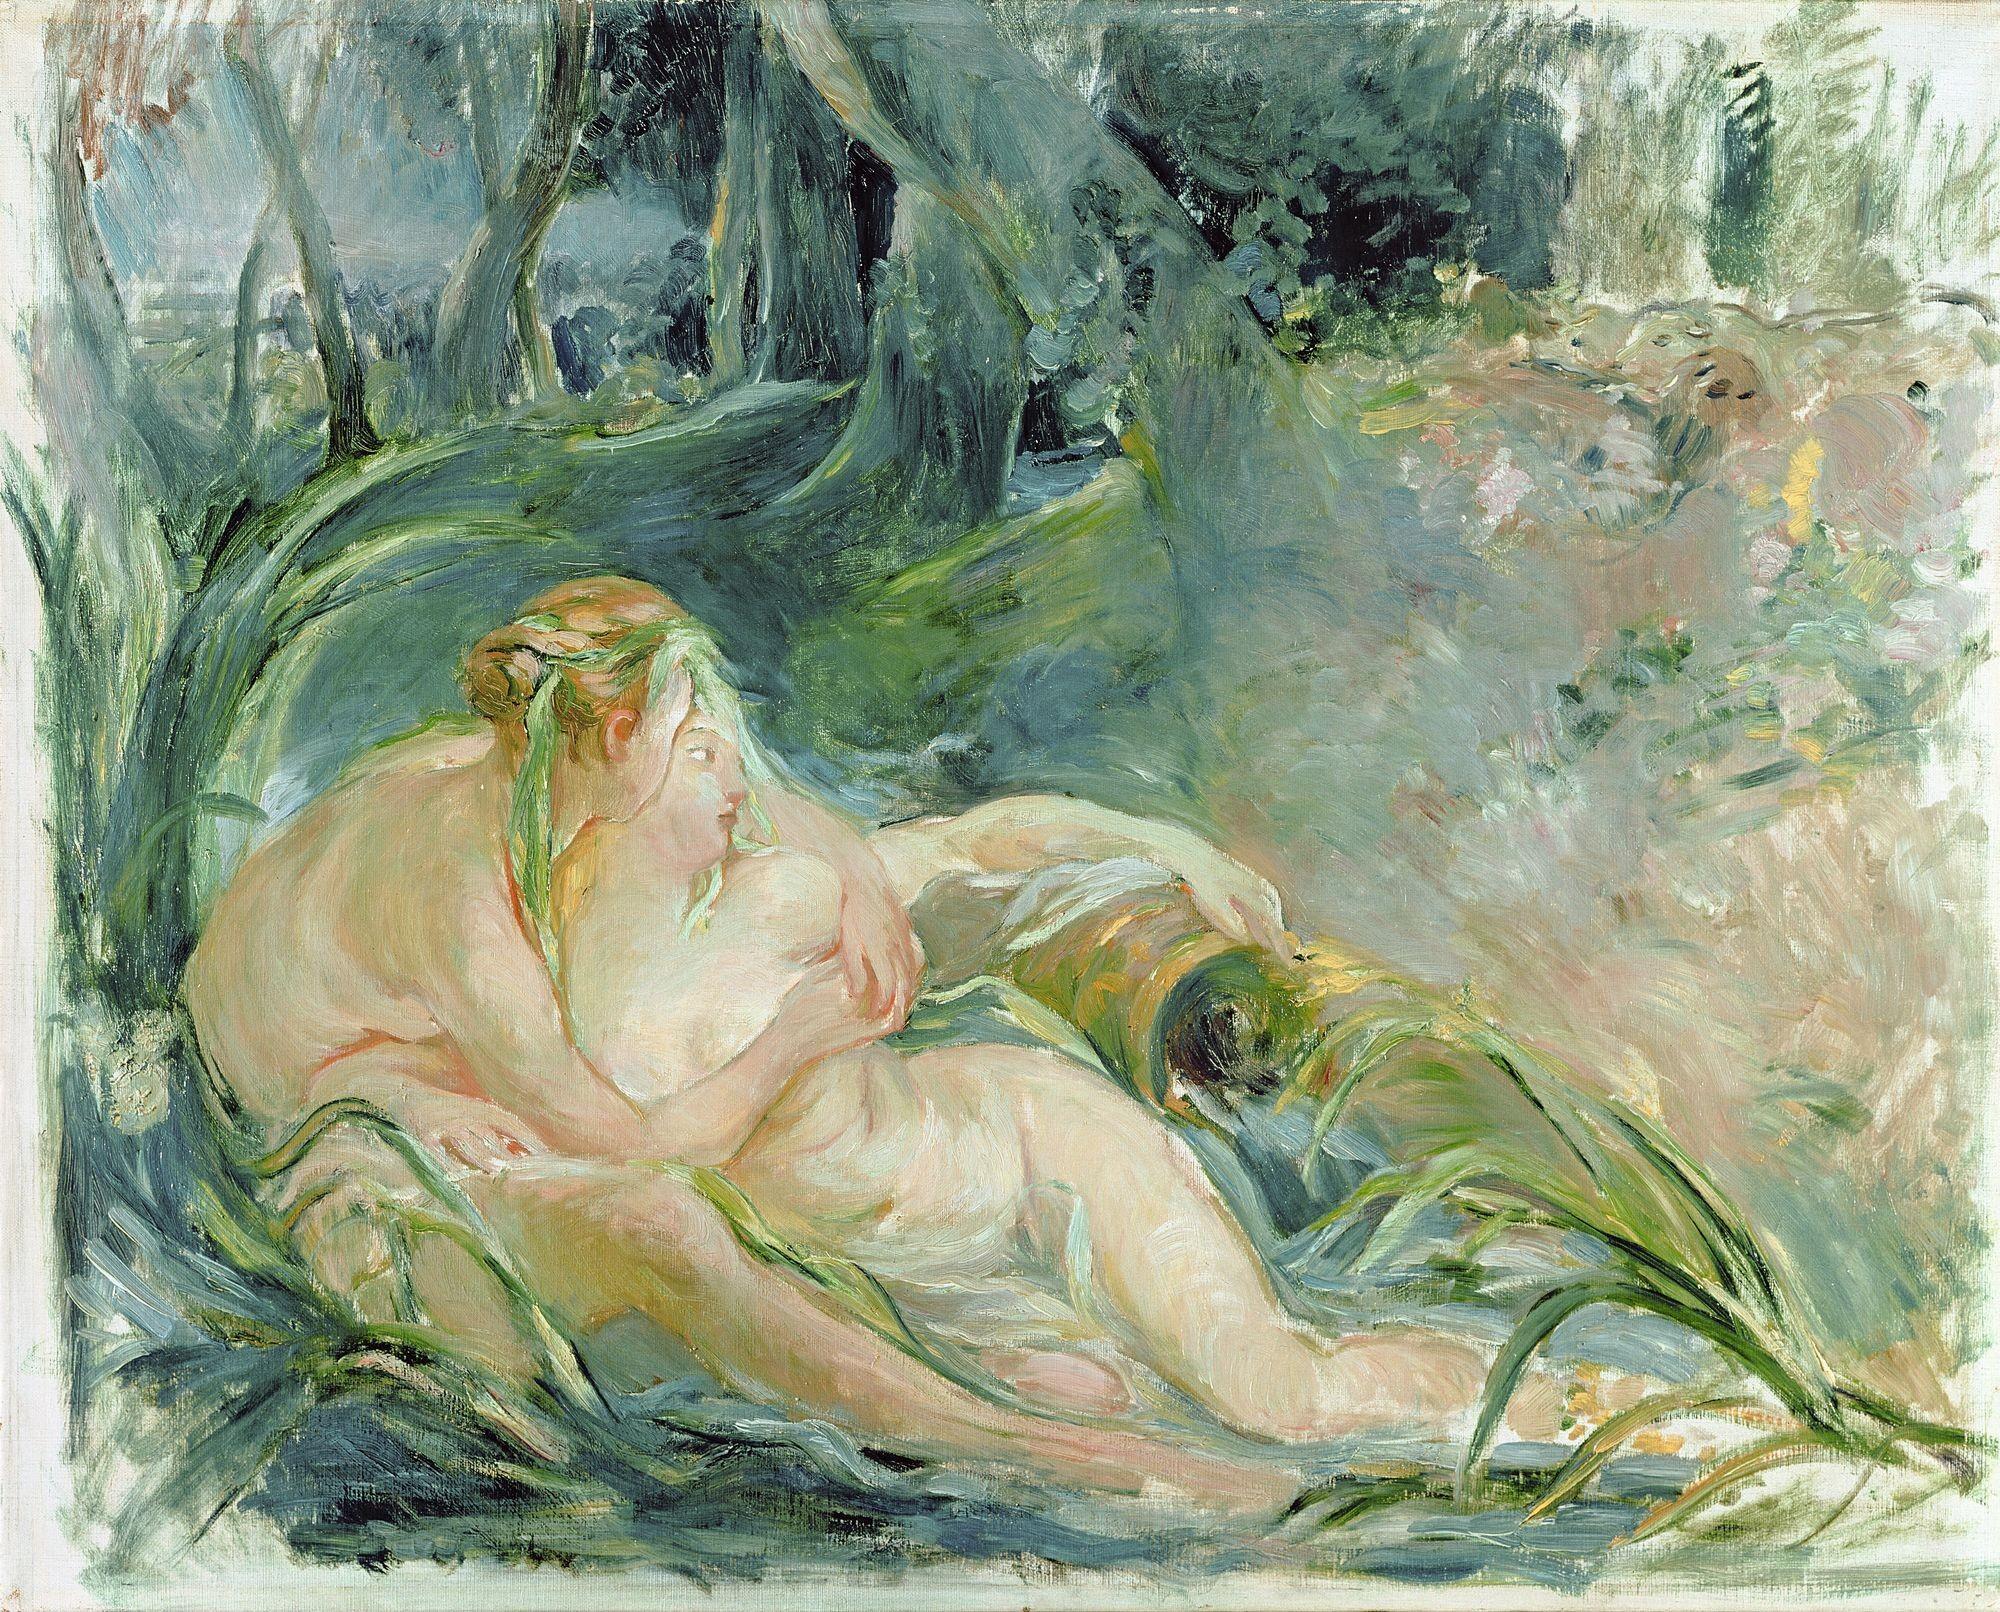 Berthe Morisot Jupiter et Callisto